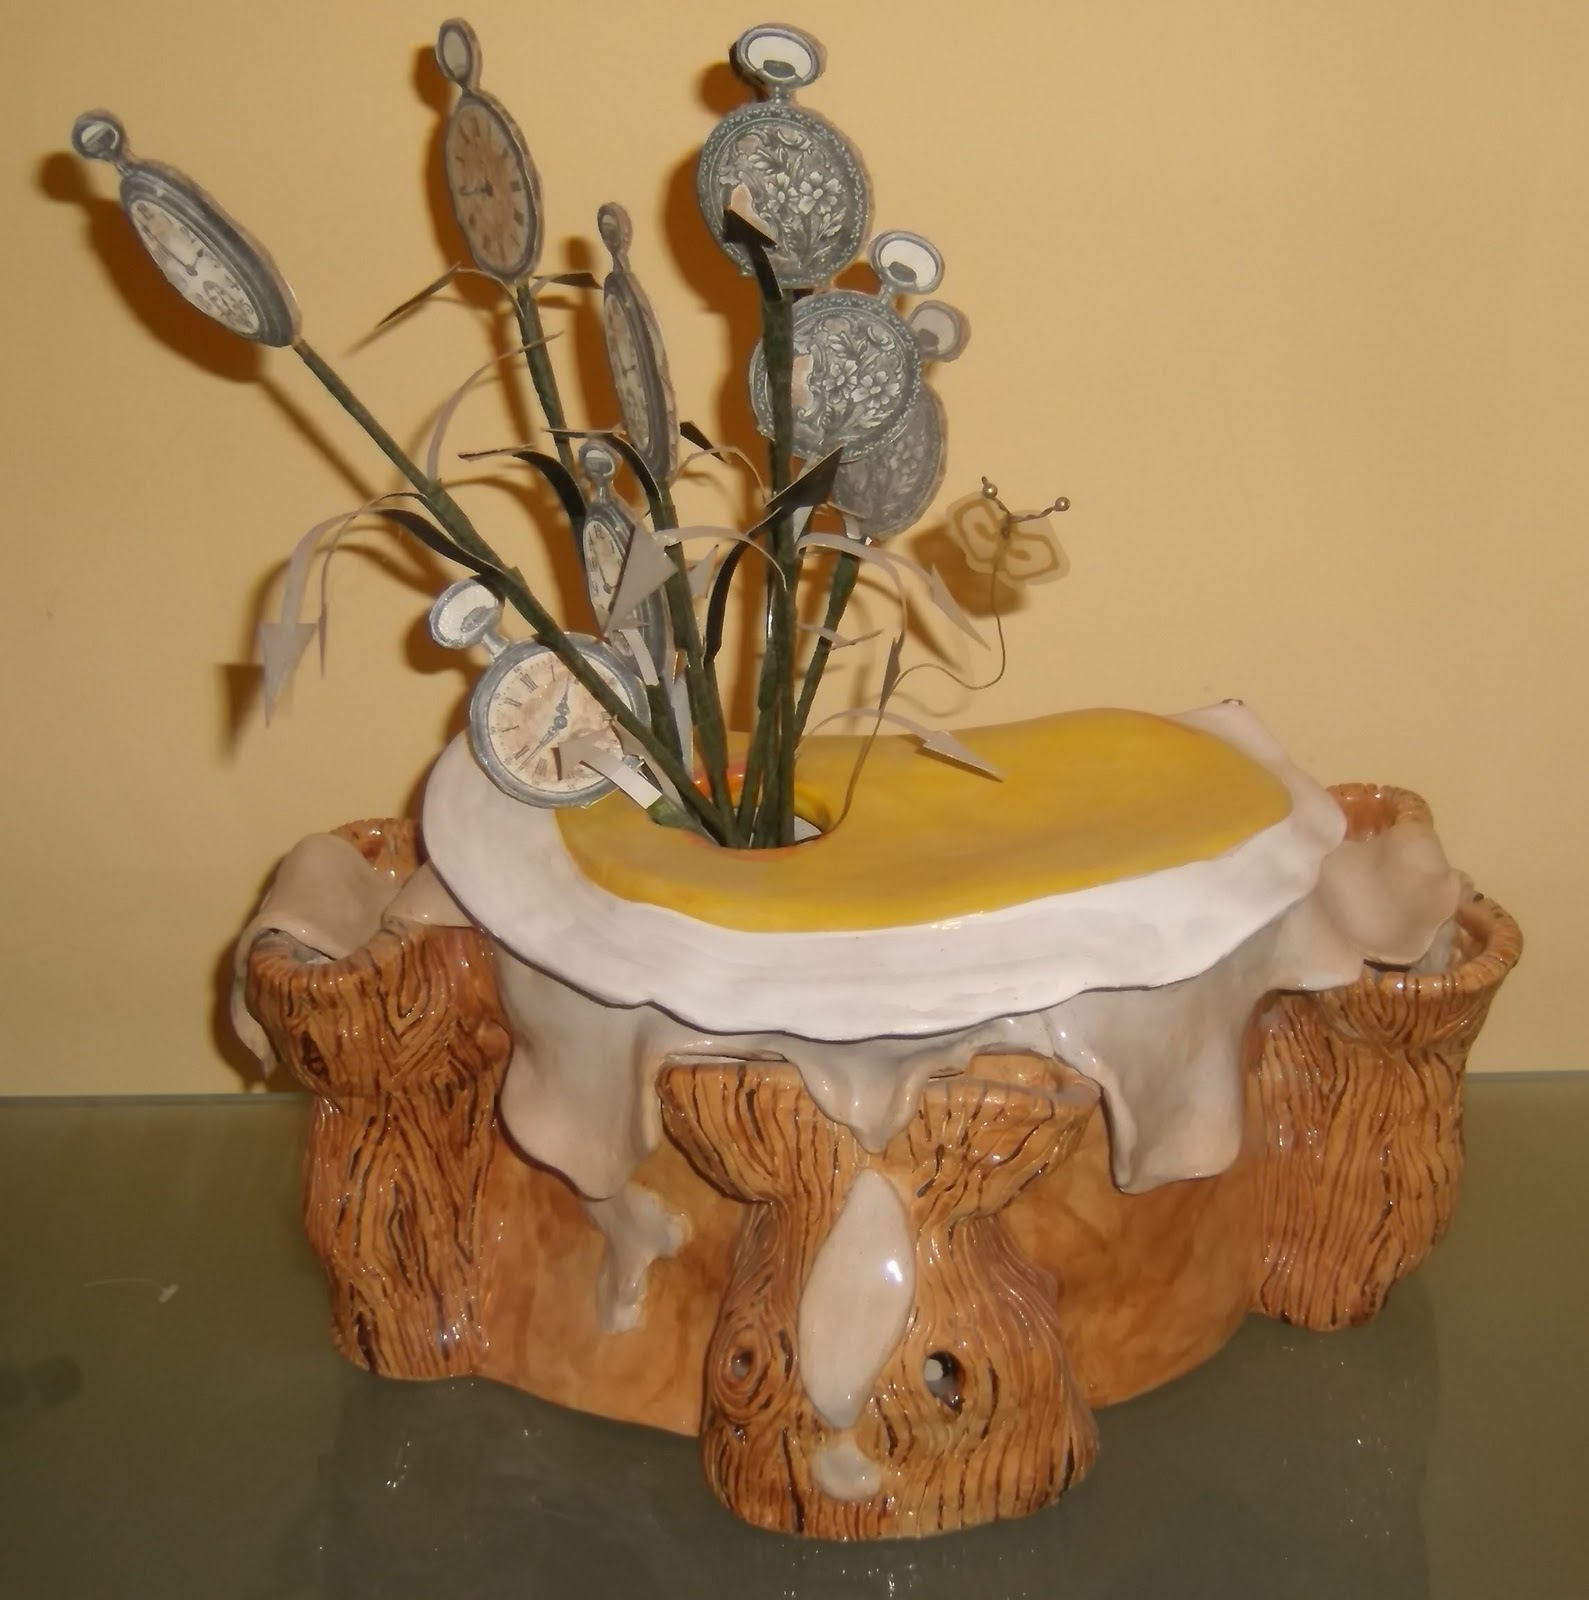 http://1.bp.blogspot.com/_Erz7lITT_F0/TUr8RwURcSI/AAAAAAAAADU/5Qd2RoY43_E/s1600/Tracys+art+008.JPG